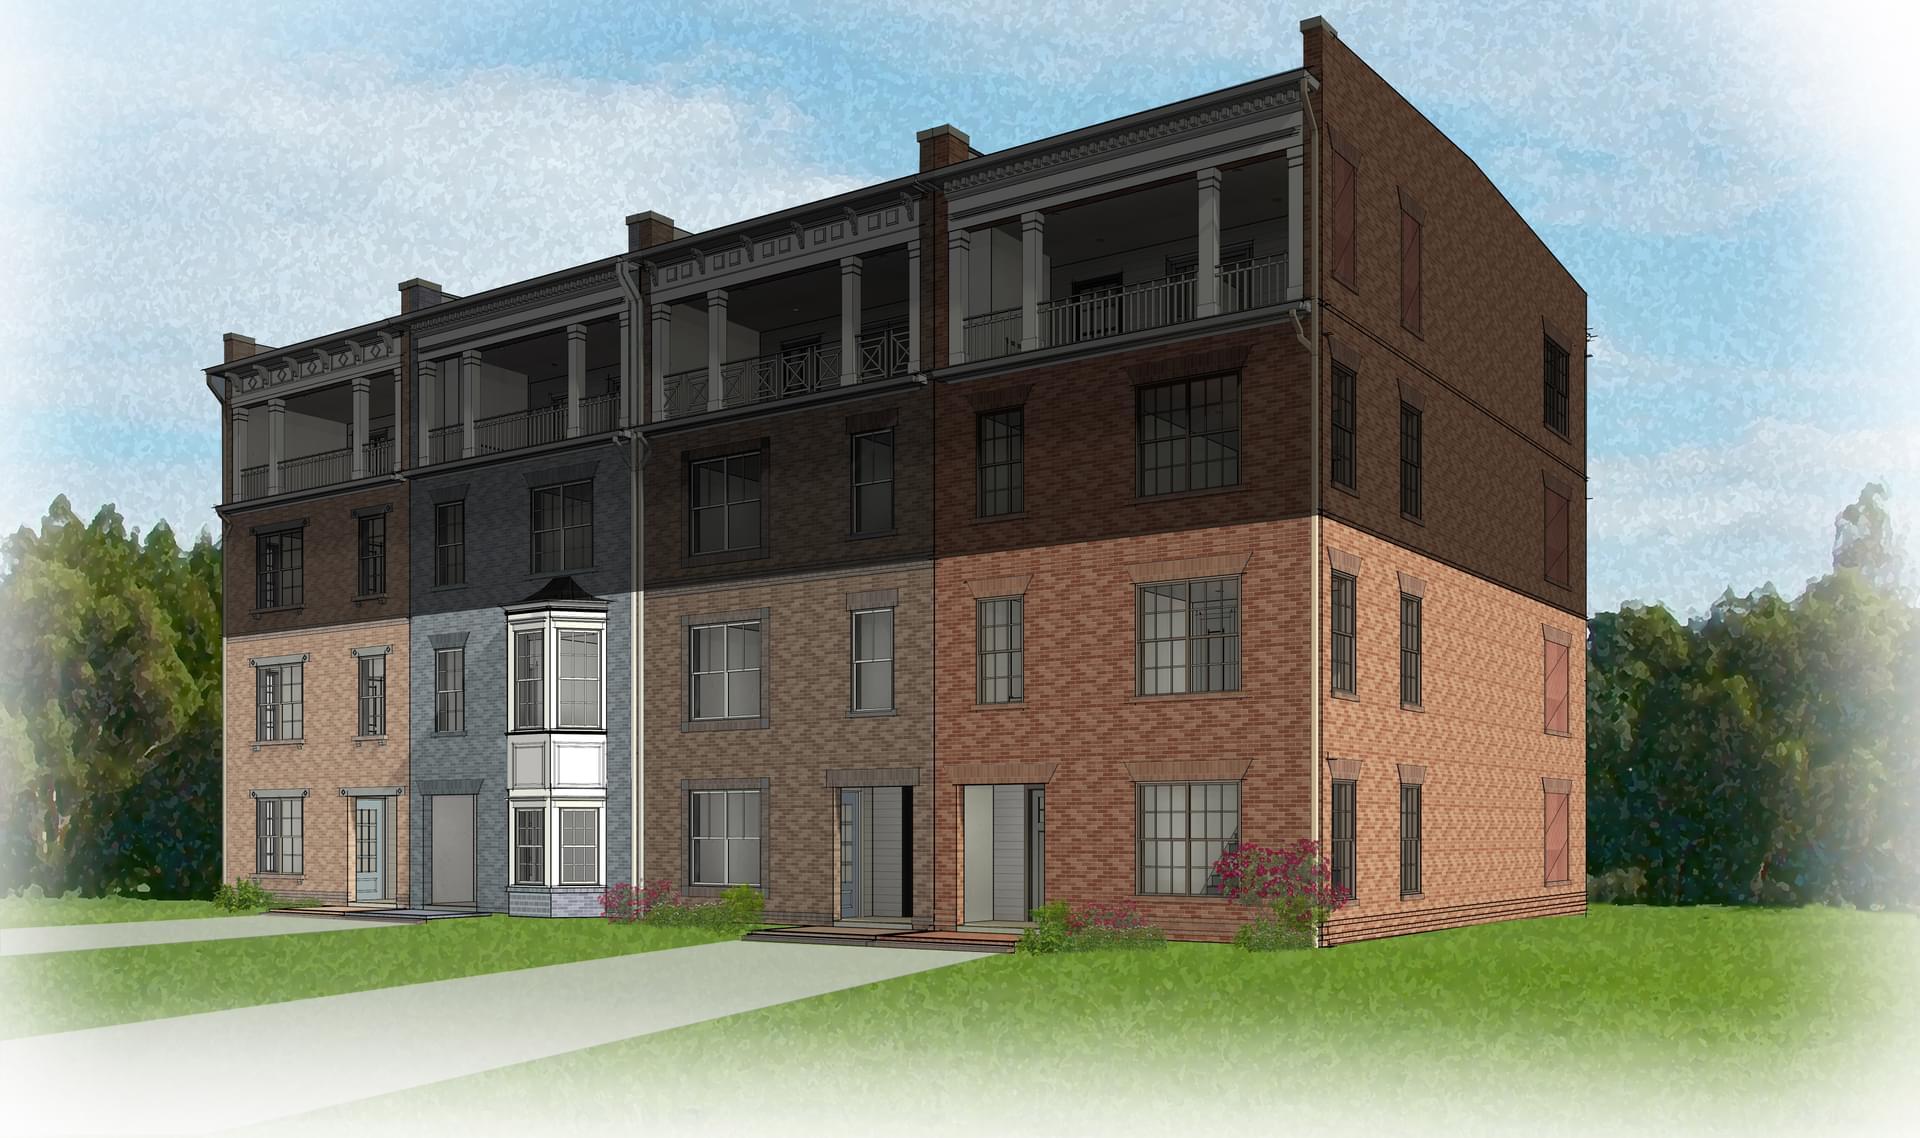 The Arlington new home in Henrico VA